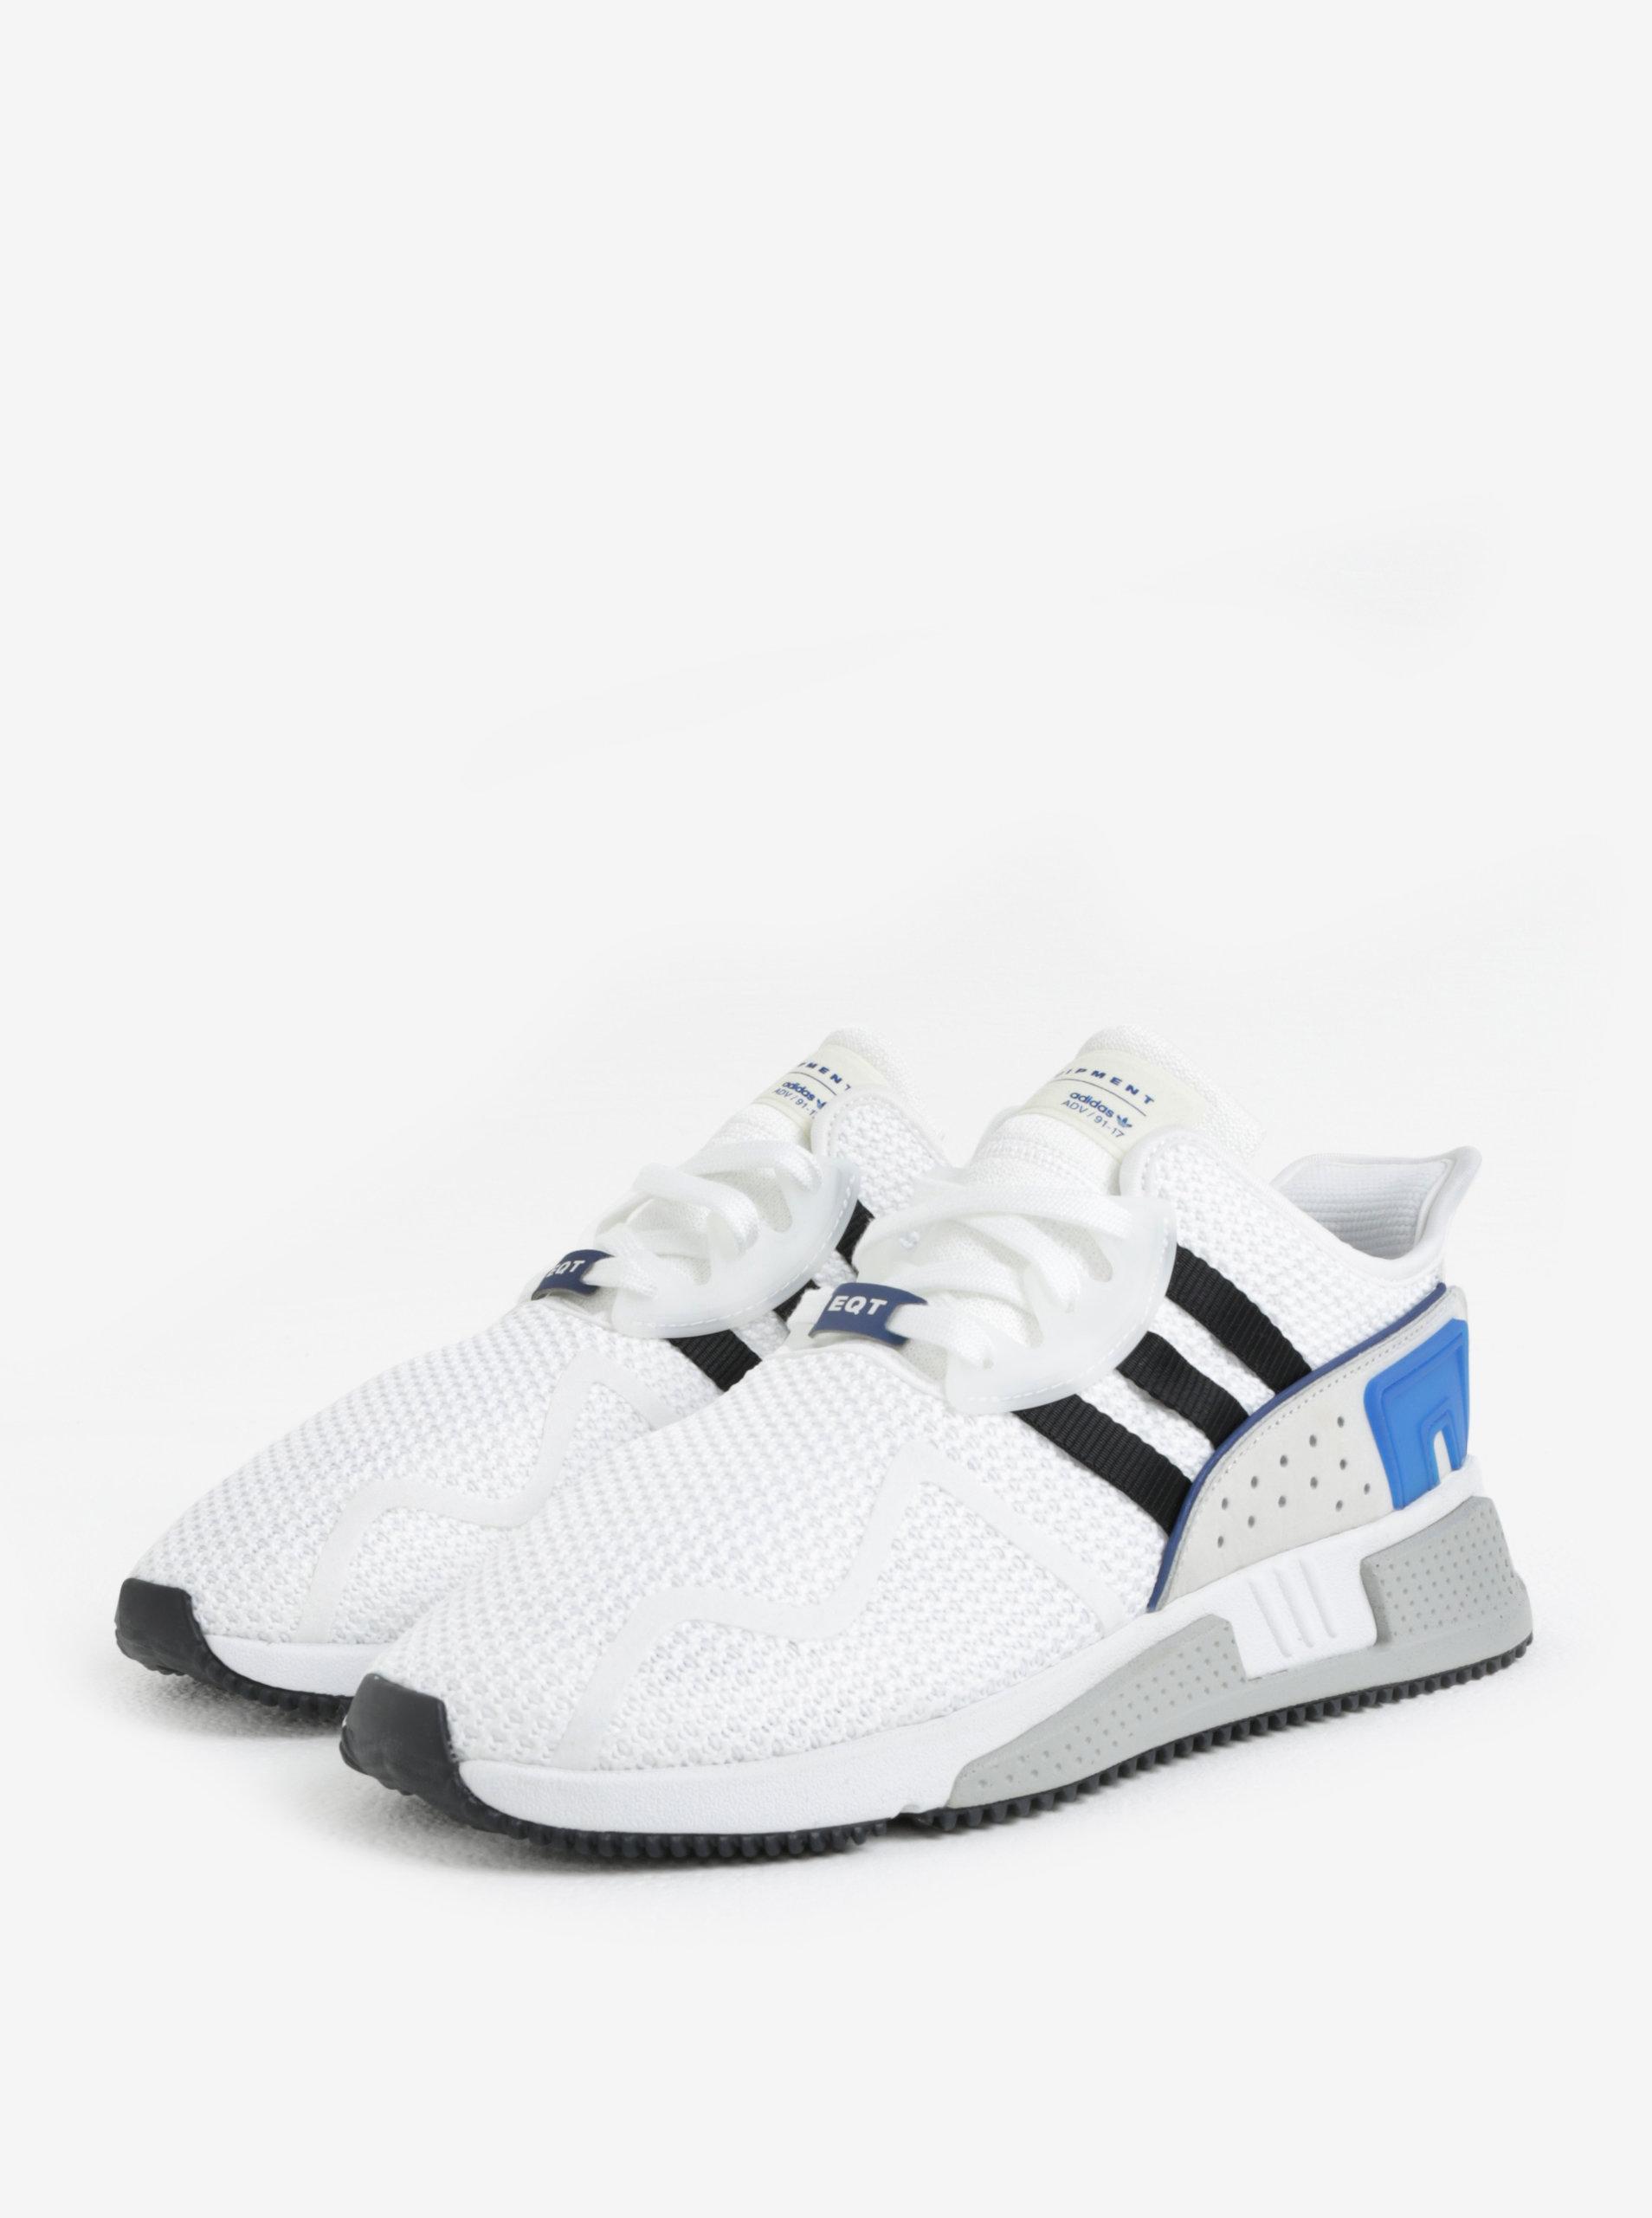 0b89d1ff0636 Biele pánske tenisky adidas Originals EQT Cushion ...